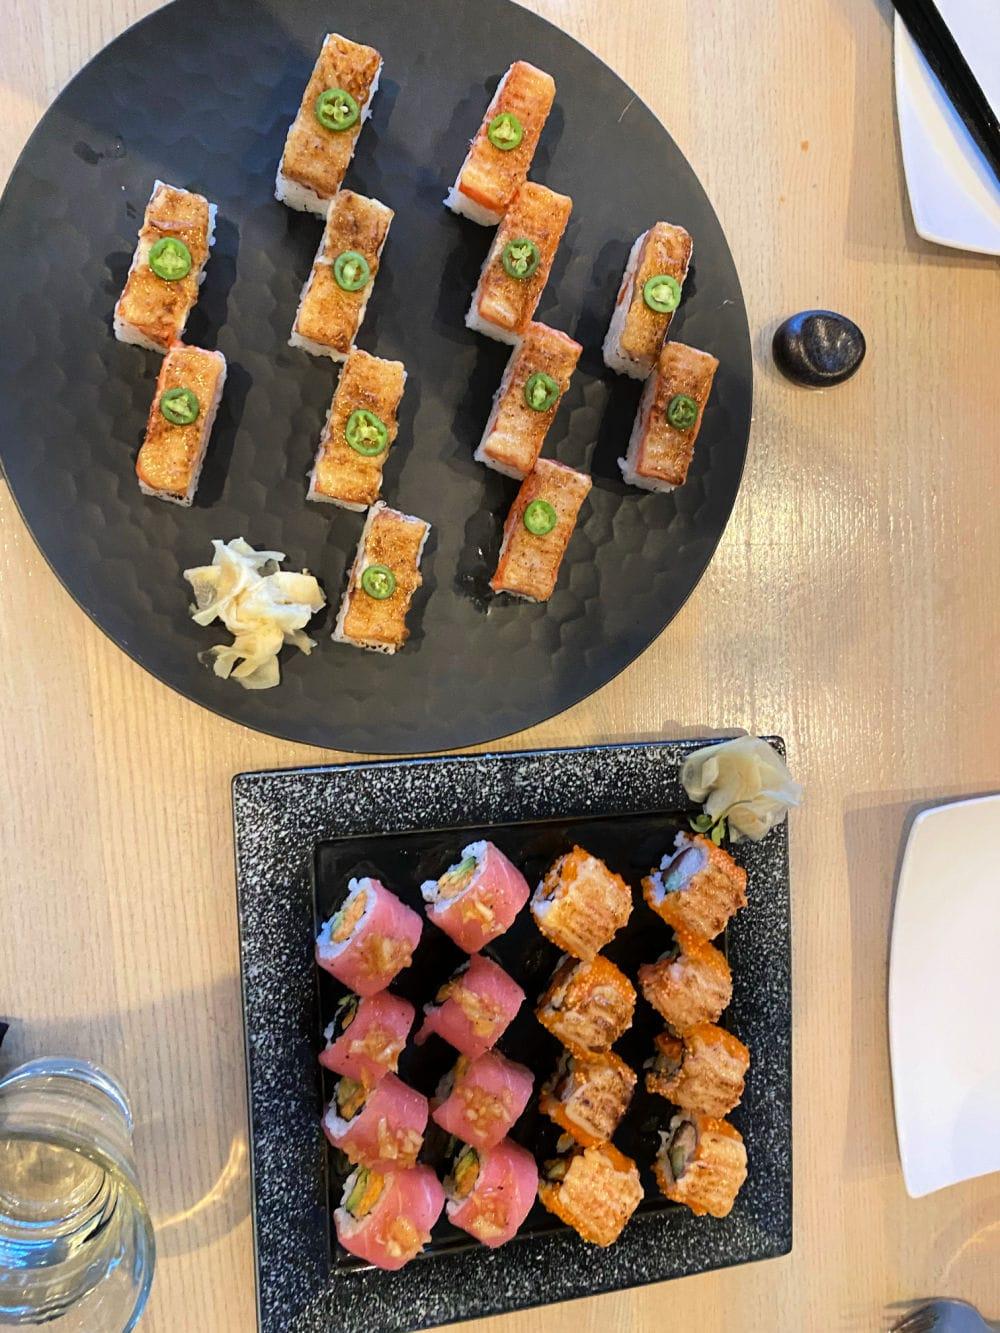 sushi at miku restaurant in Vancouver, bc